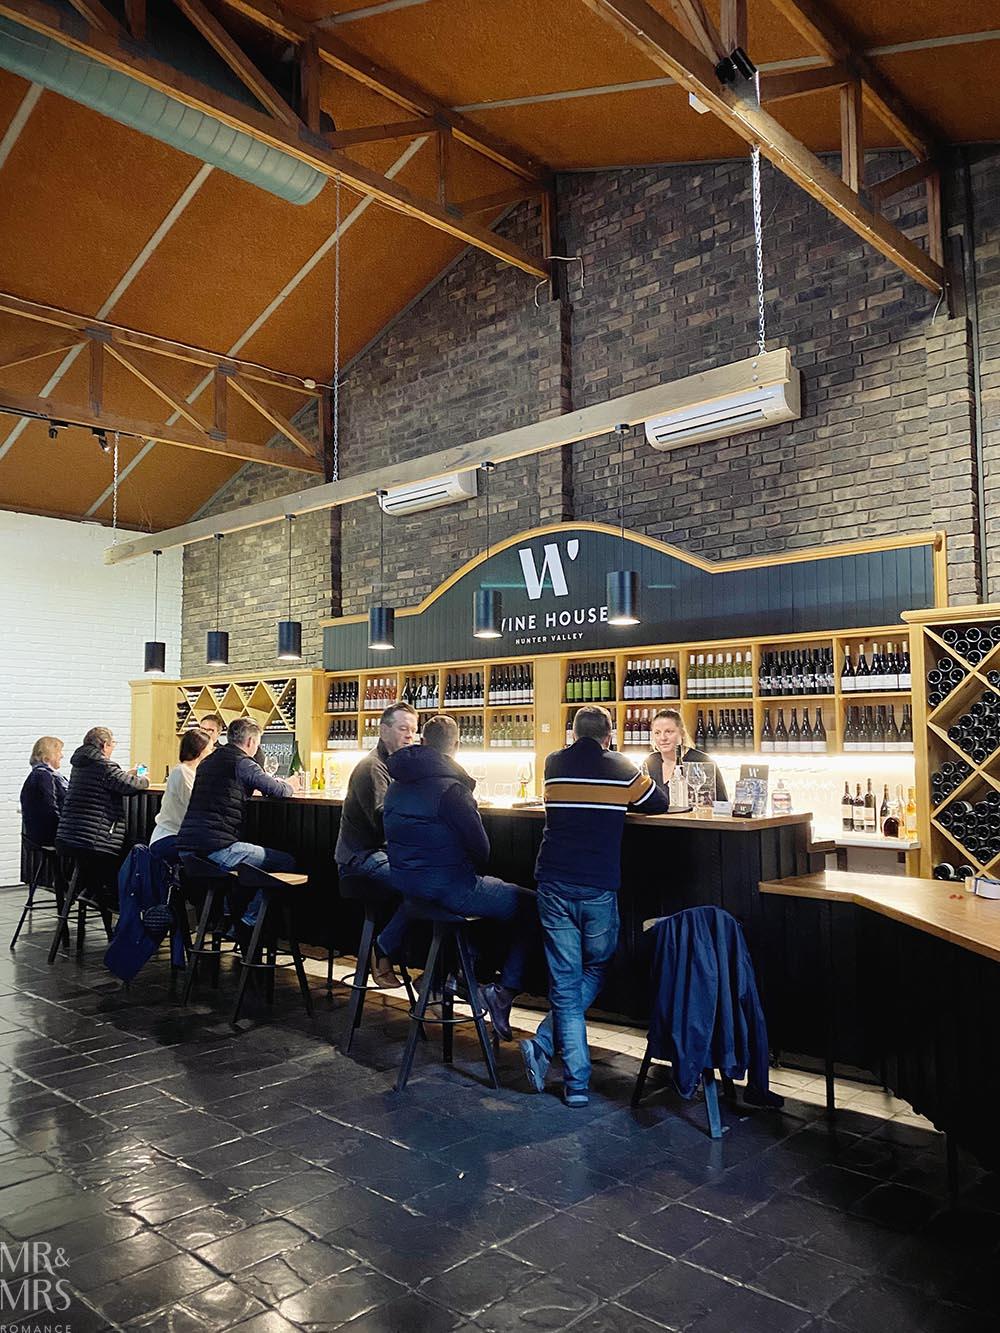 Penfolds Grange vs Hunter Valley Shiraz The Wine Store, Pokolbin #hvwff